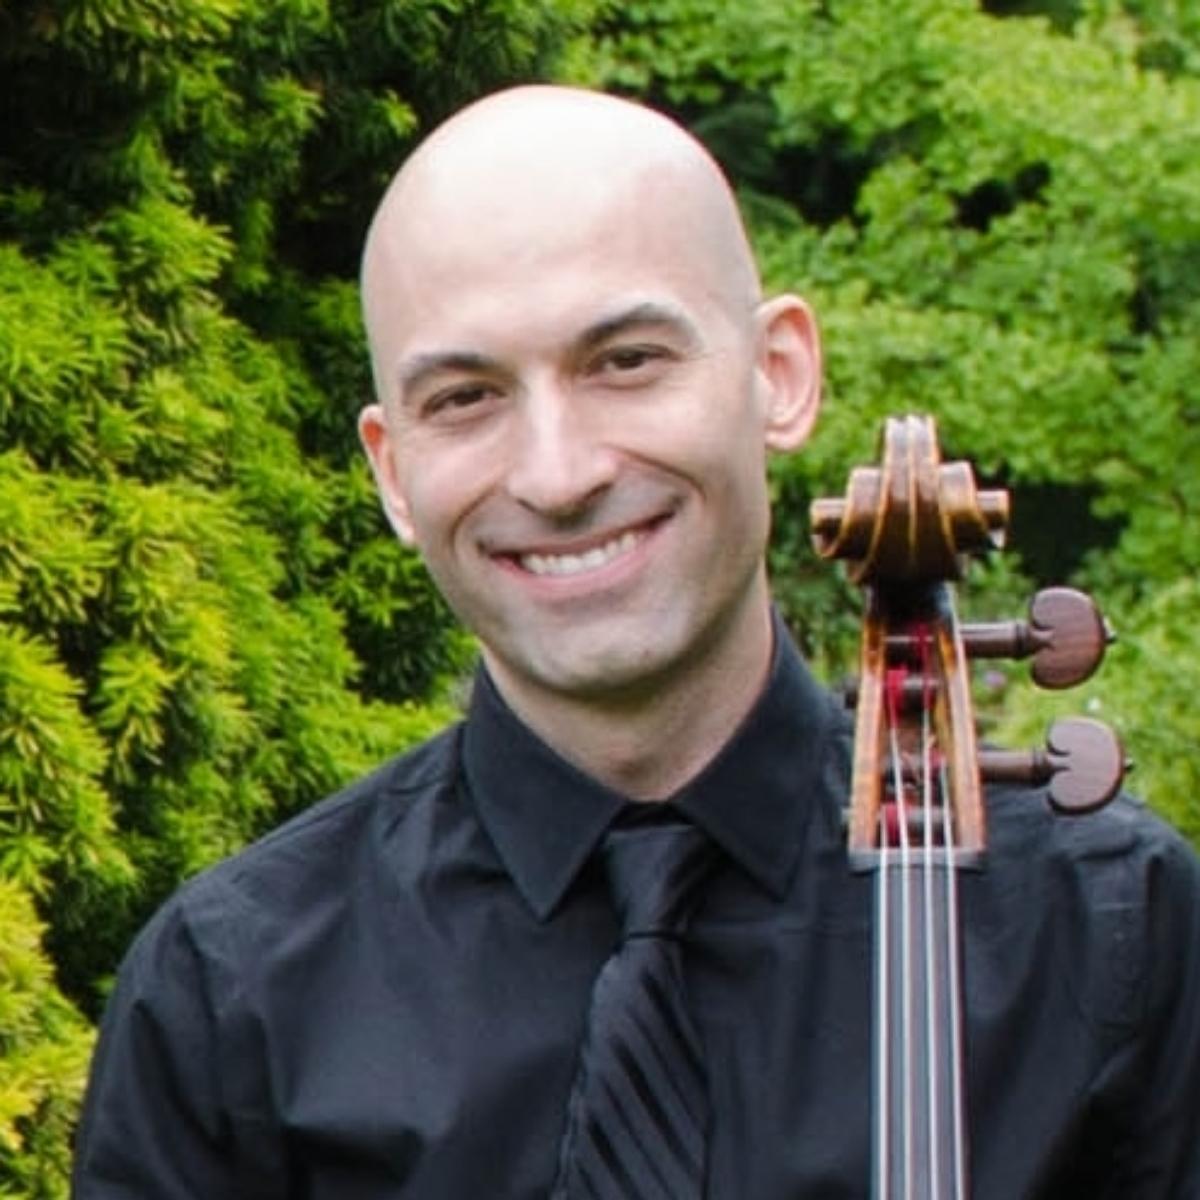 PETER WILLIAMS, cello